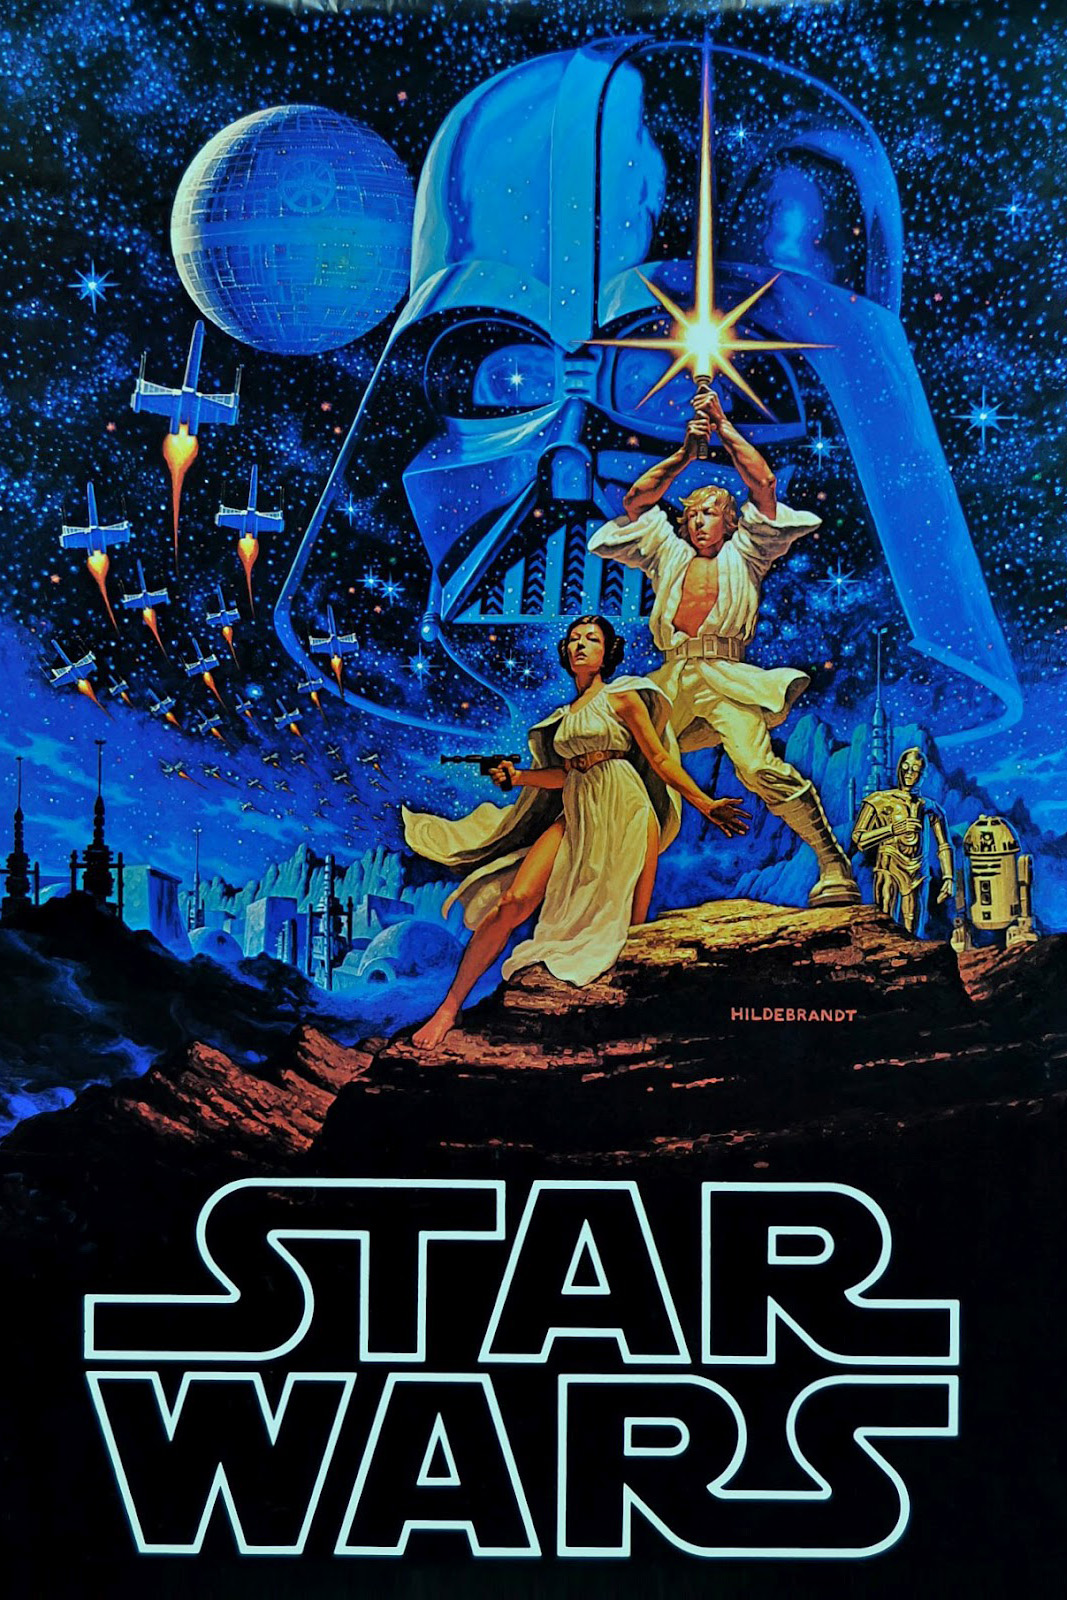 Star Wars Style B.jpg